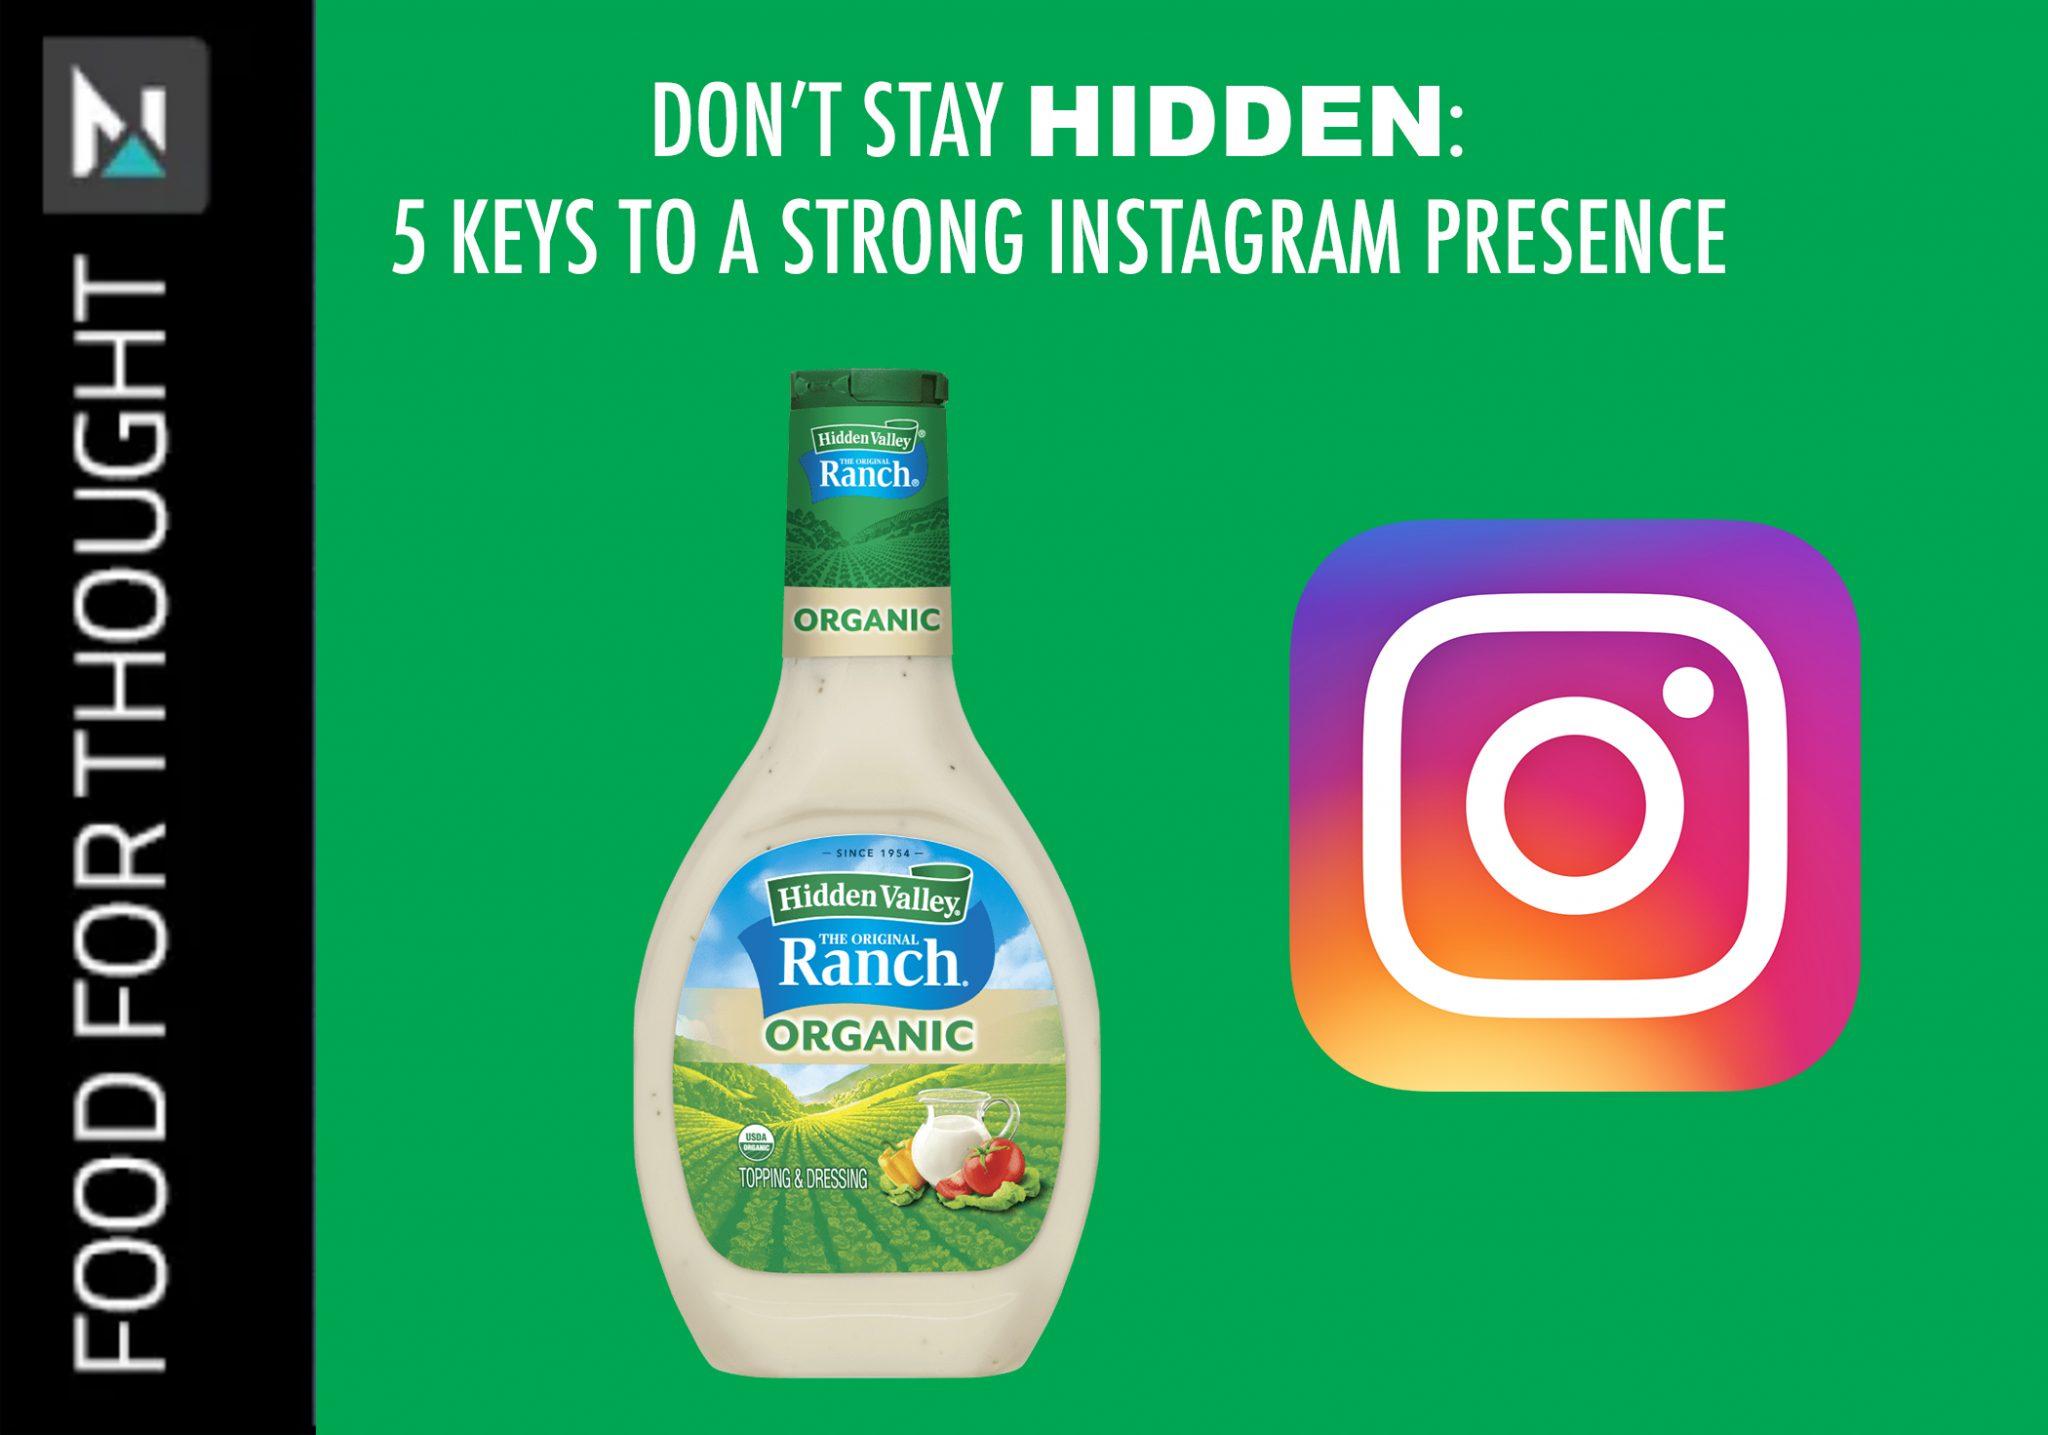 Don't Stay Hidden